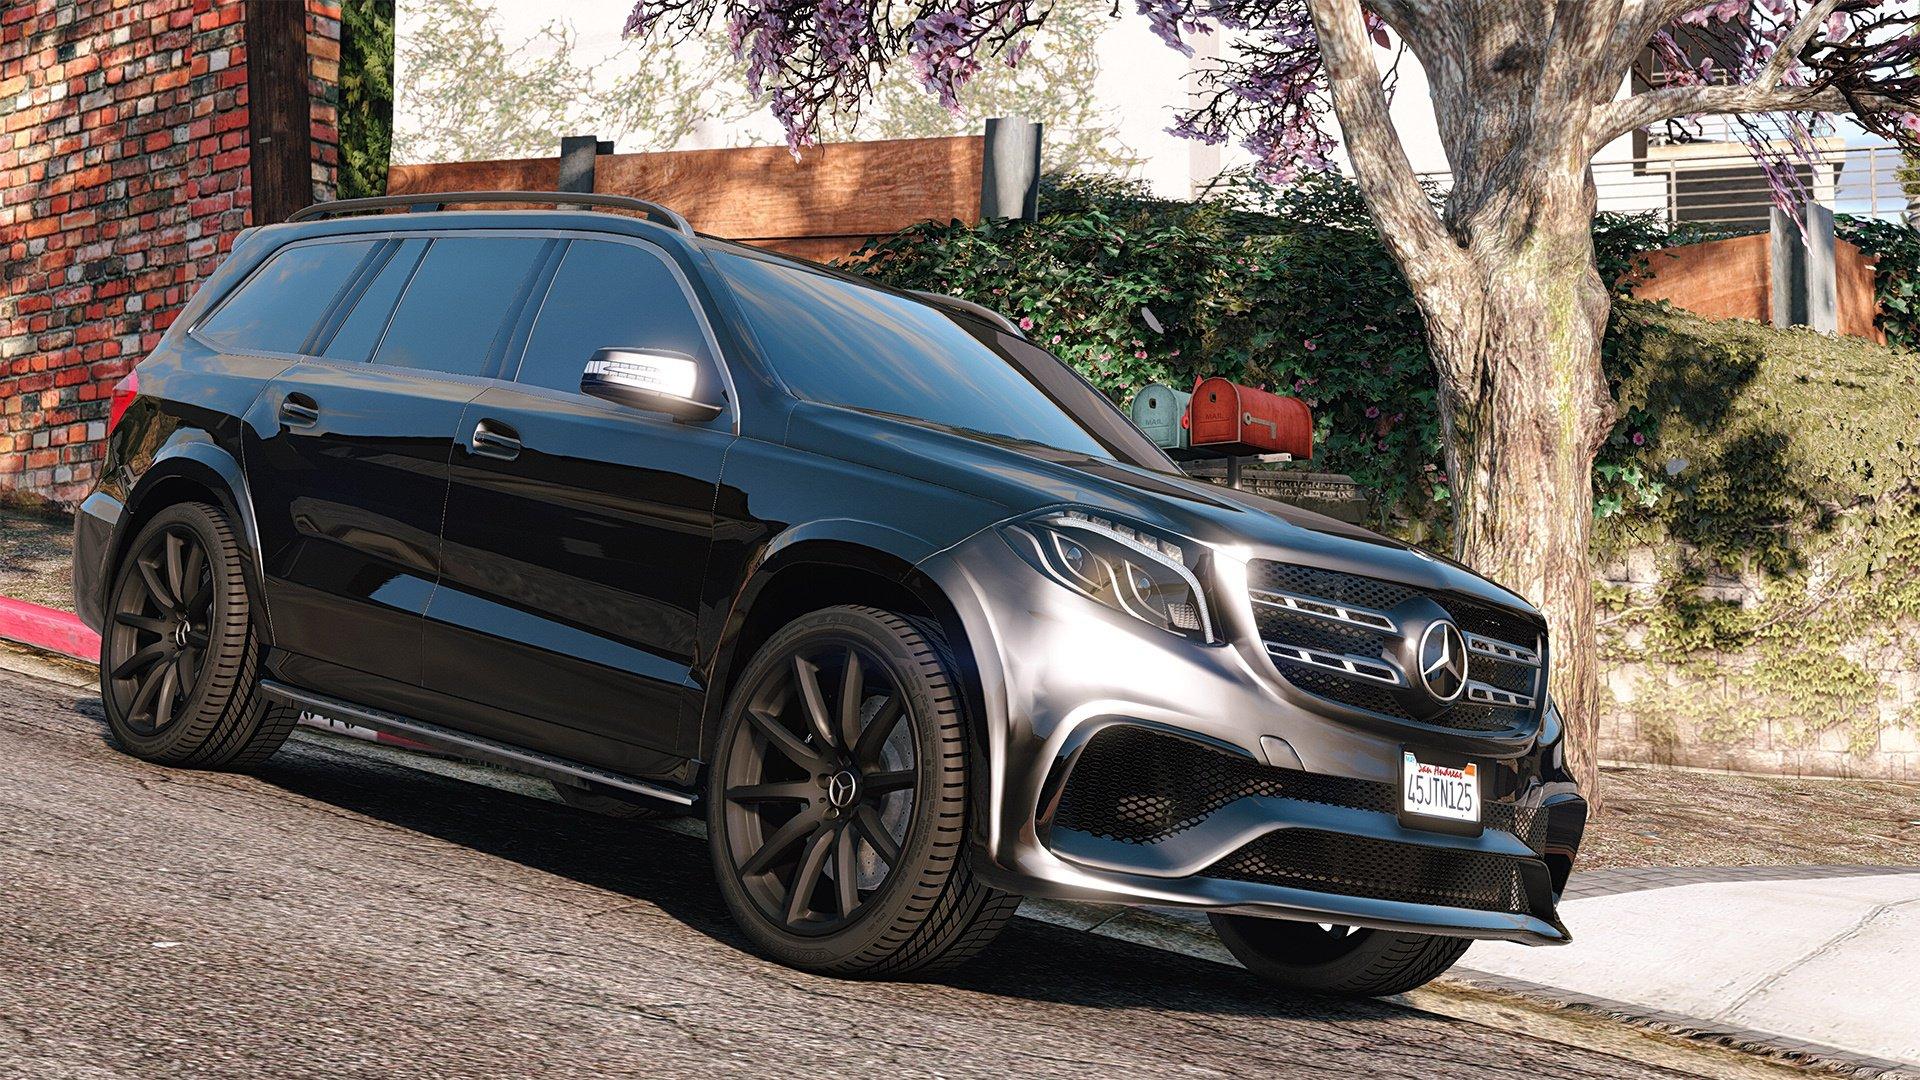 Mercedes-Benz GLS 63 AMG 2015